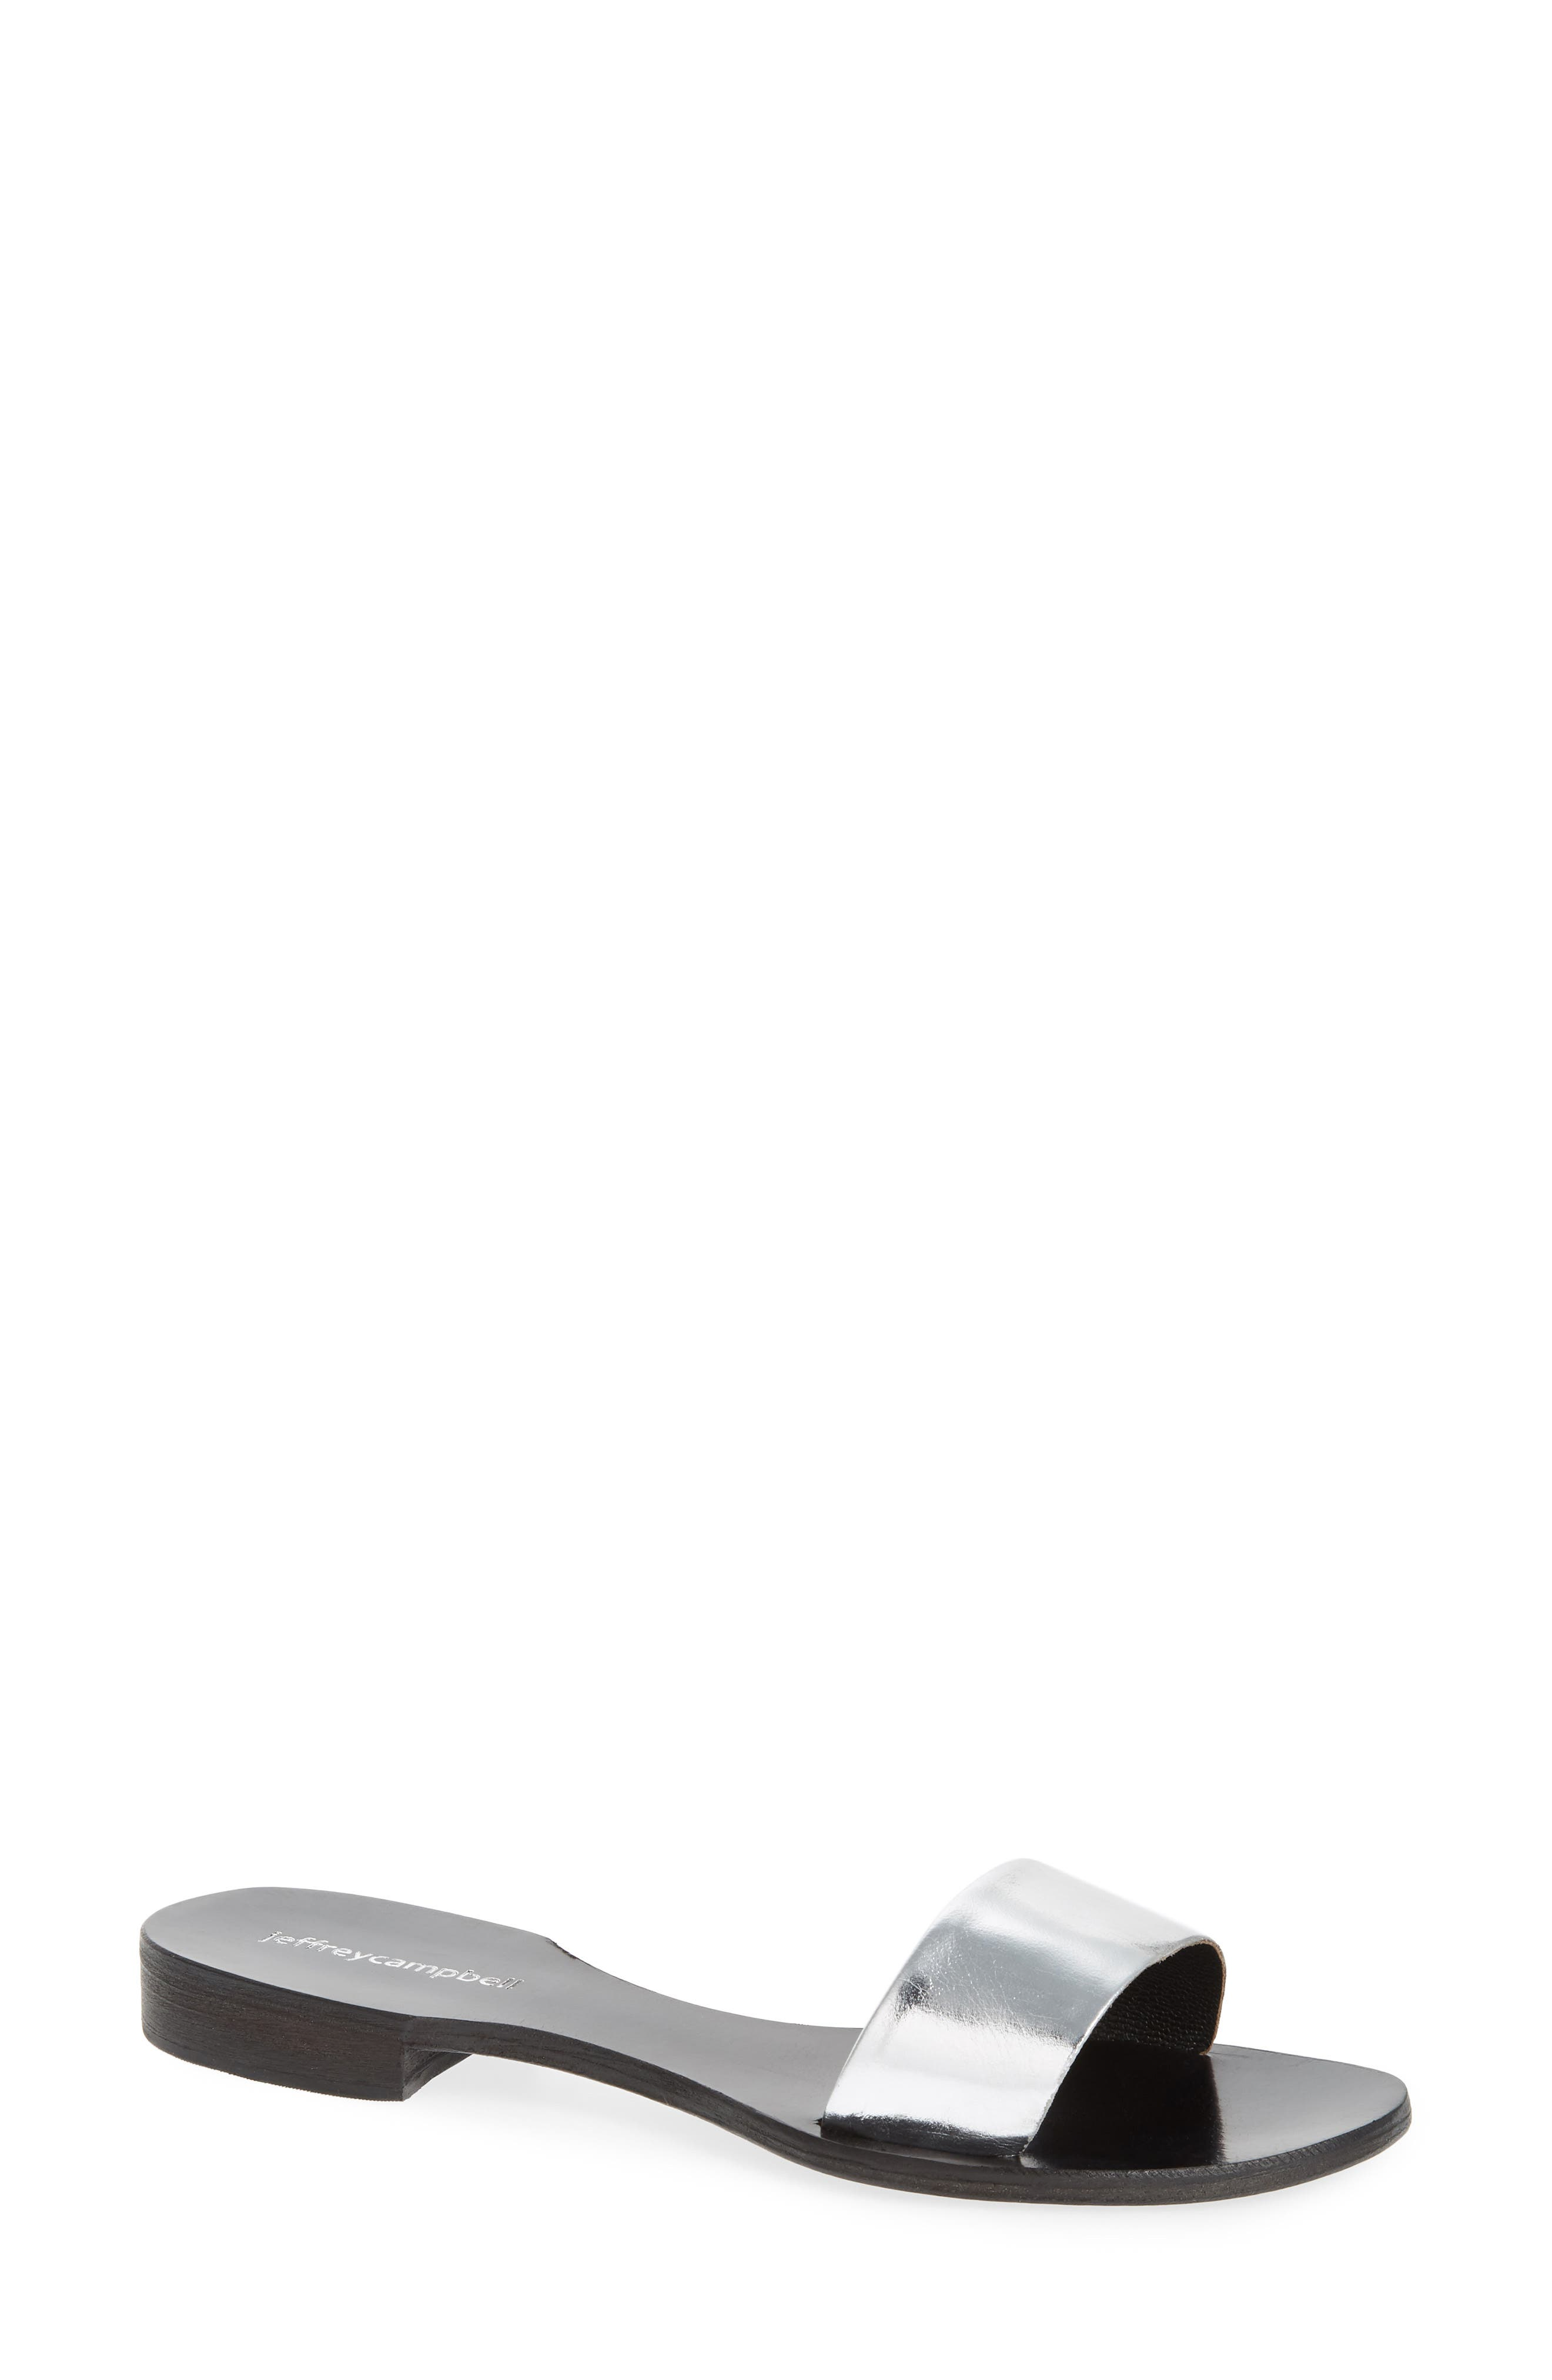 Monzon Slide Sandal,                         Main,                         color, Silver Mirror